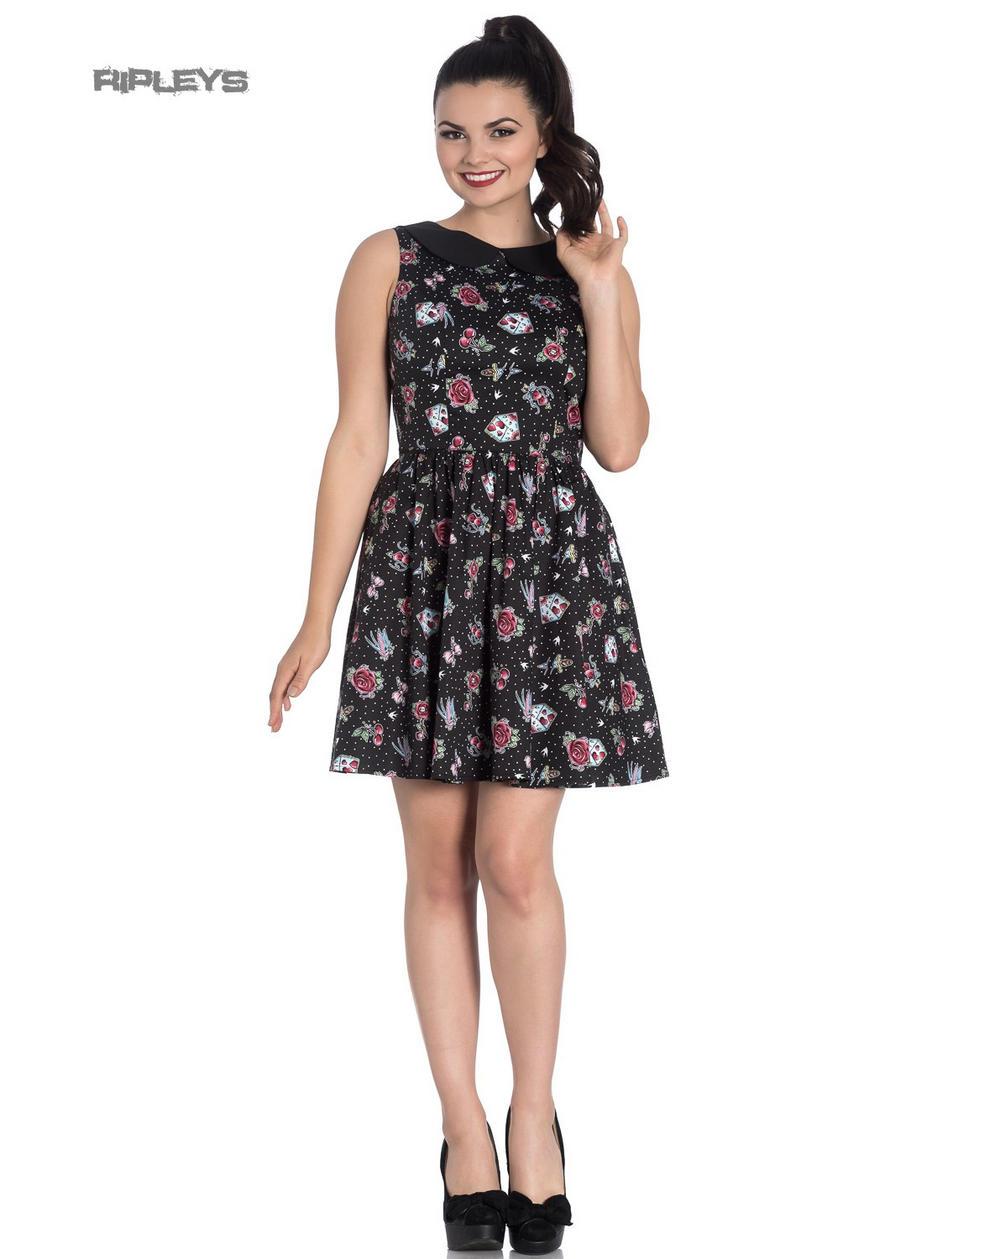 b689f8c9e43e Hell Bunny Black Mini Dress Cherry Swallows Polka Dot STEVIE Tattoo All  Sizes